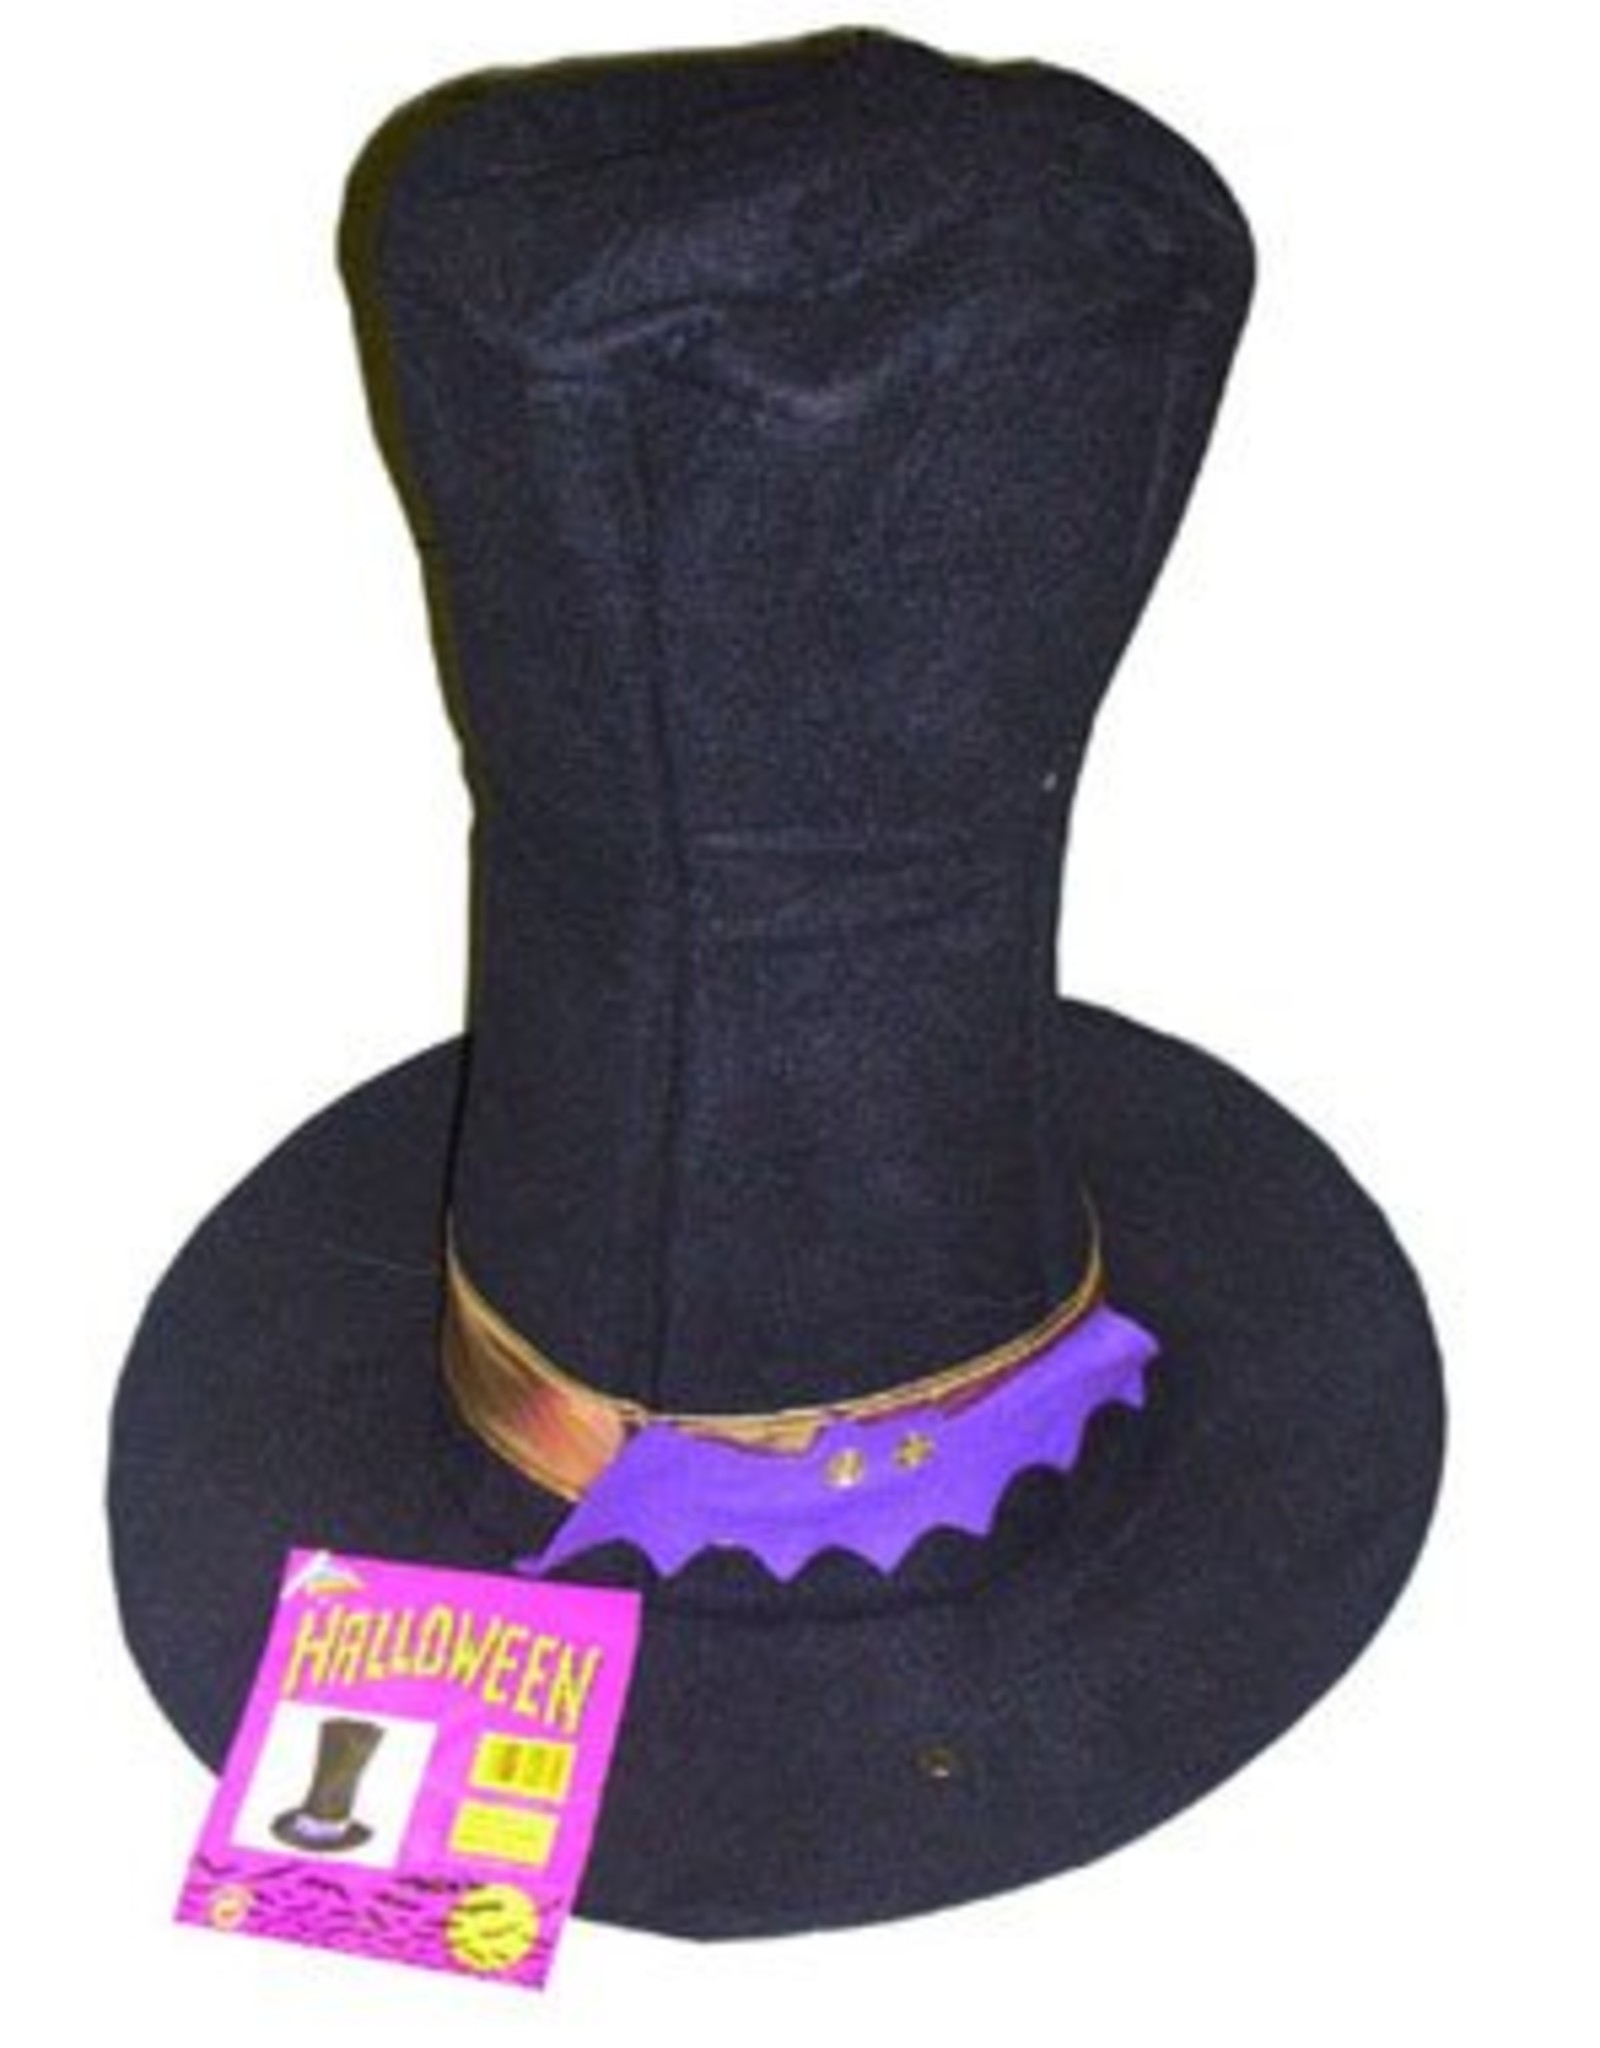 ESPA hoge hoed 45cm tovenaar